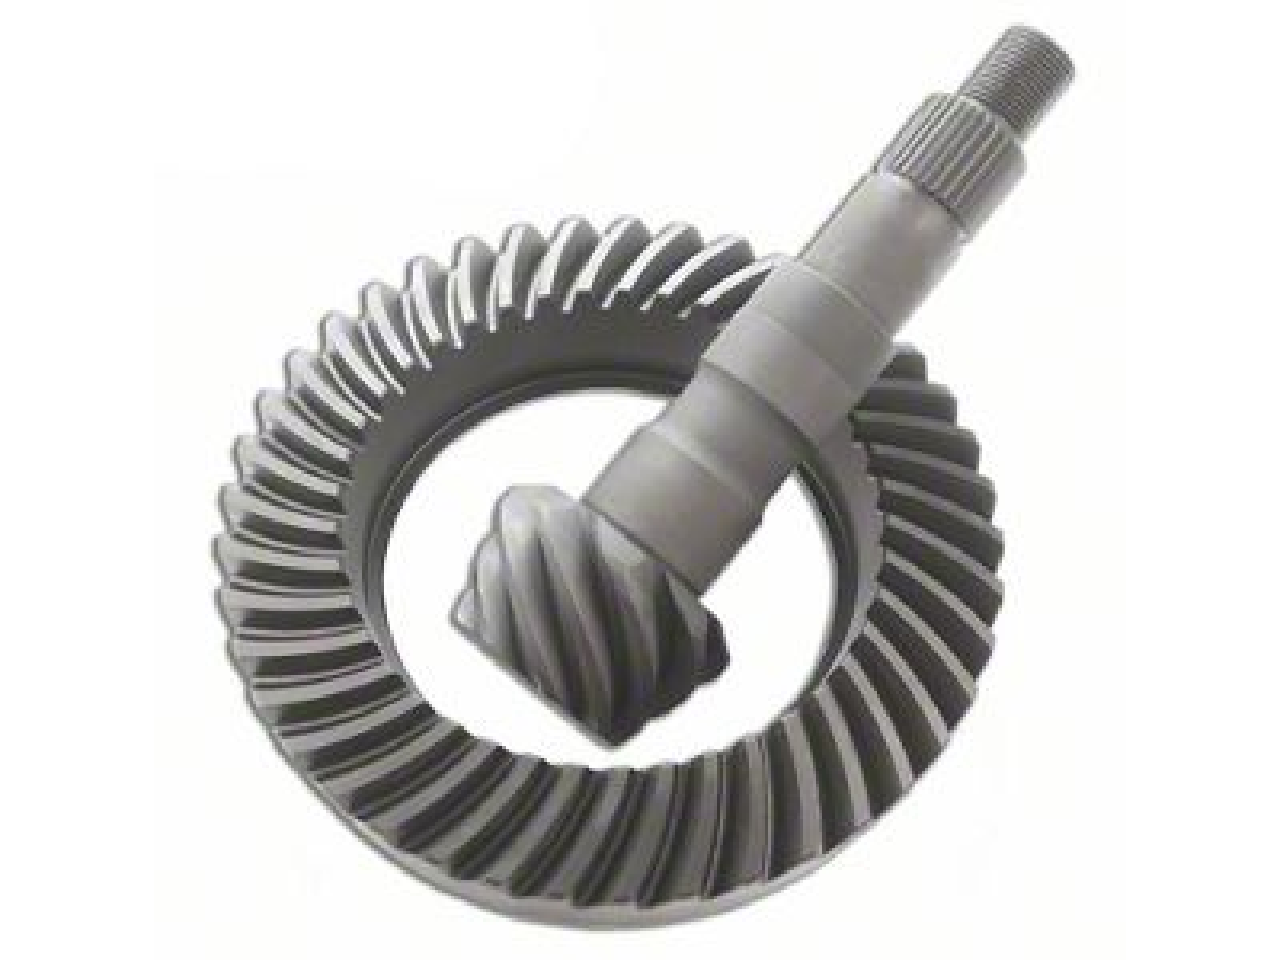 Motive Performance 8.5 in. & 8.6 in. Rear Ring Gear and Pinion Kit - 5.13 Gears (07-18 Sierra 1500)